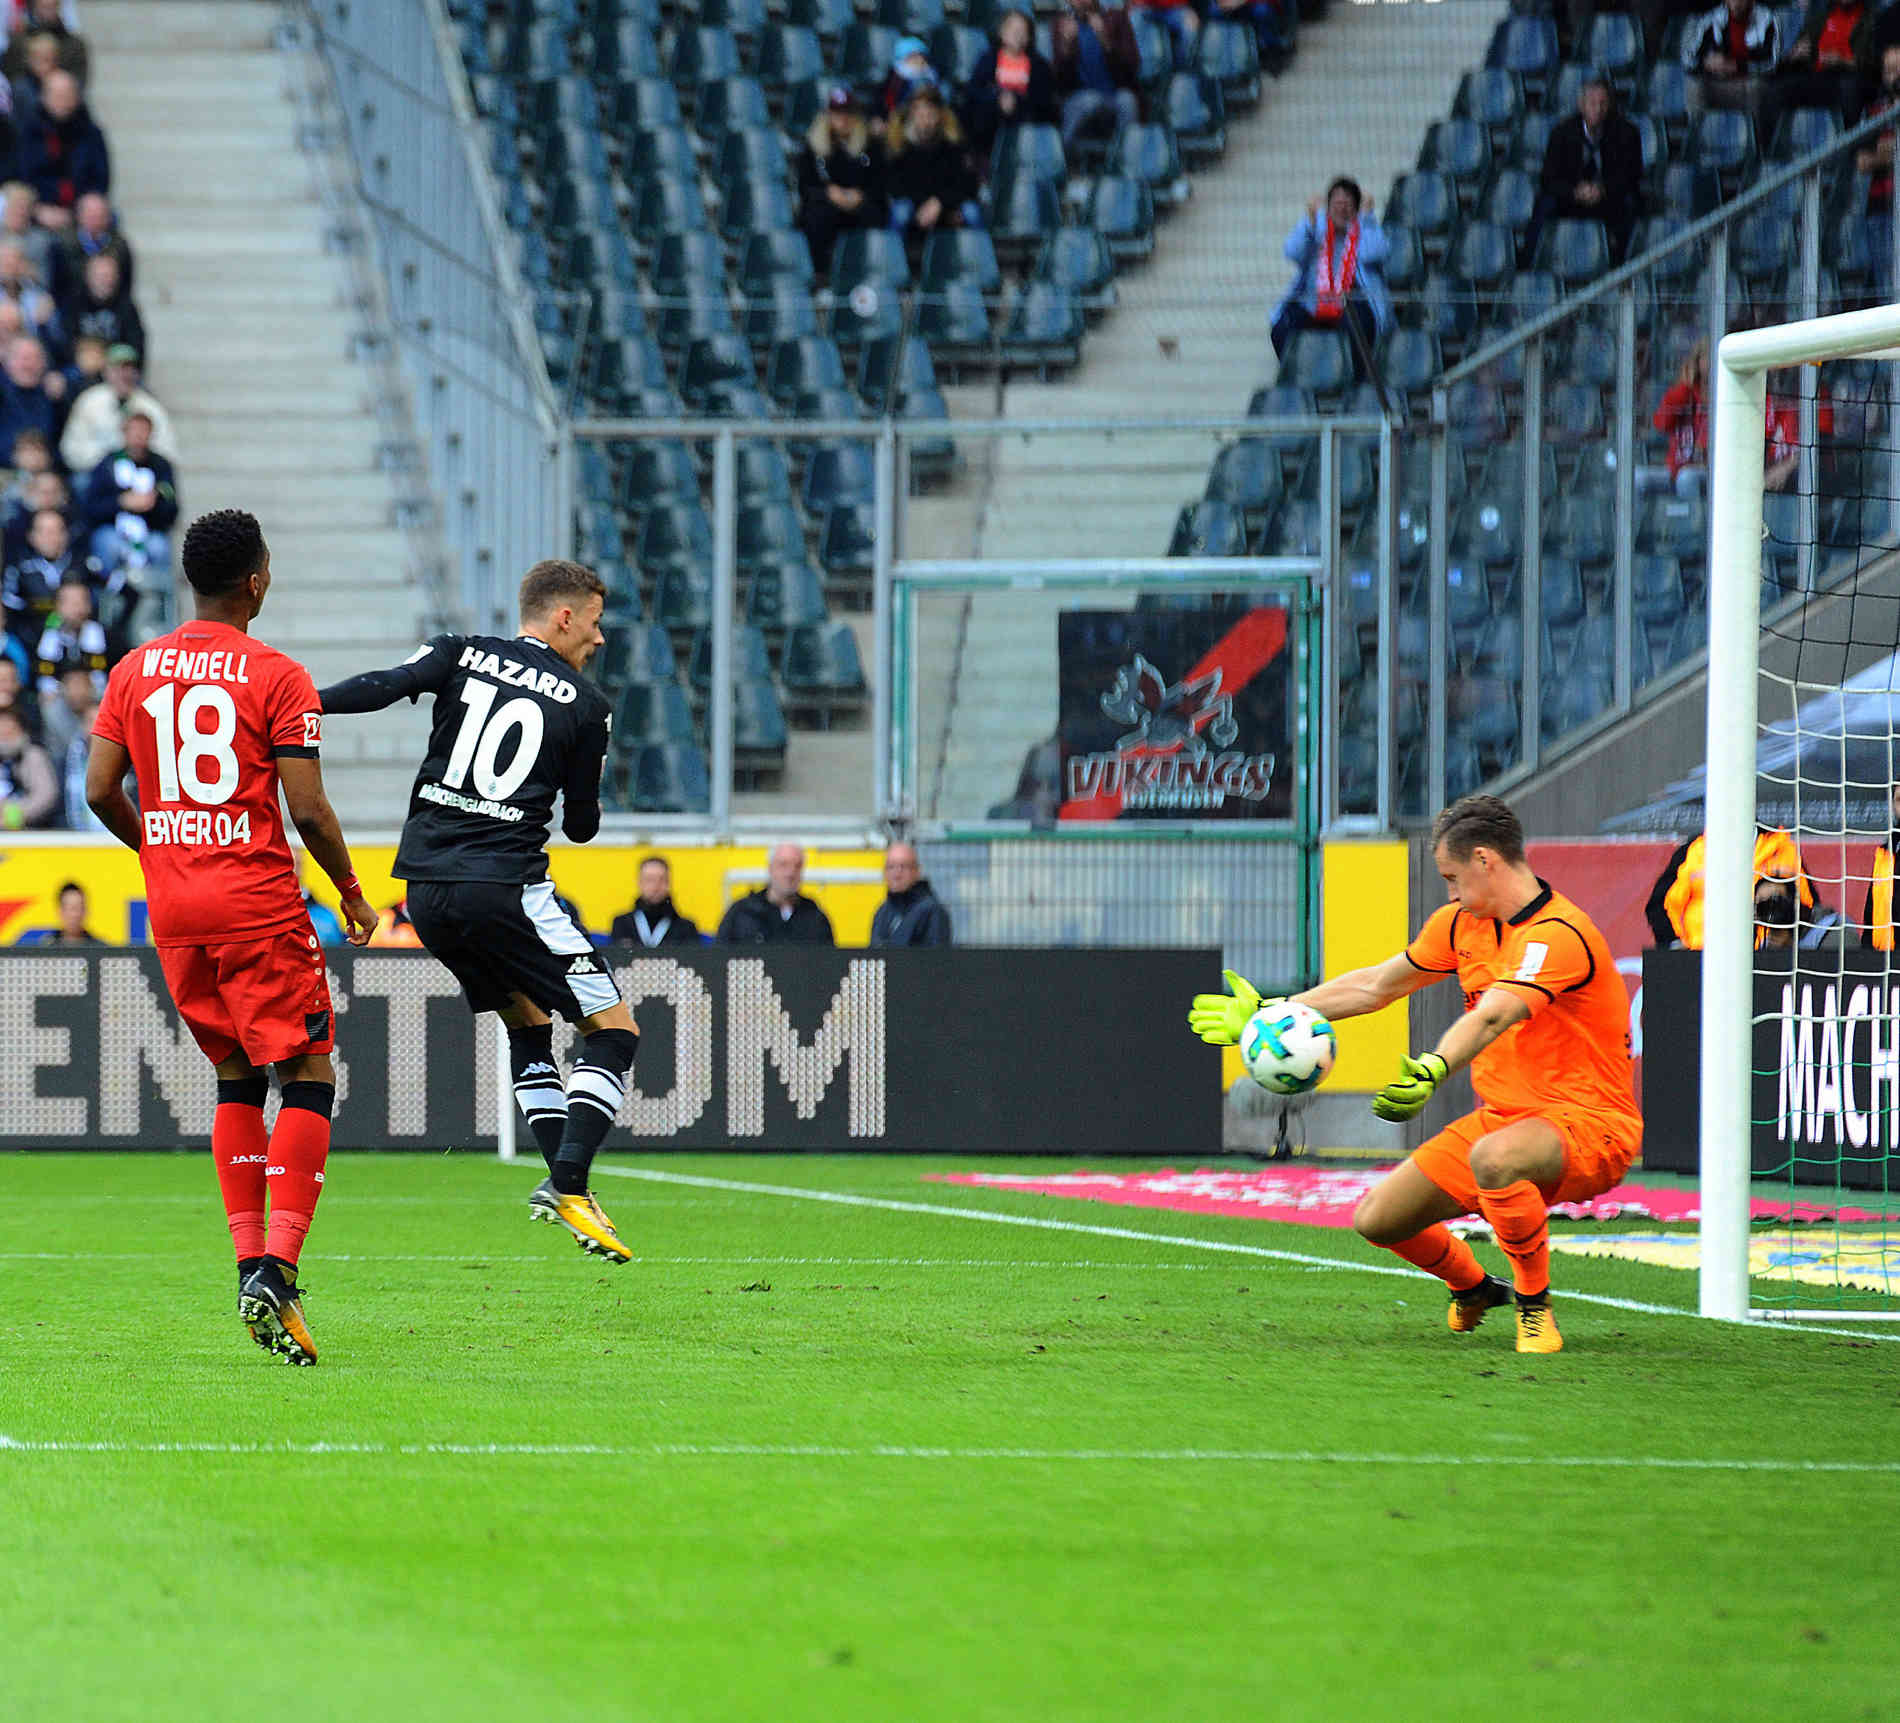 Borussia Monchengladbach Thorgan Hazard Bei Expected Goals